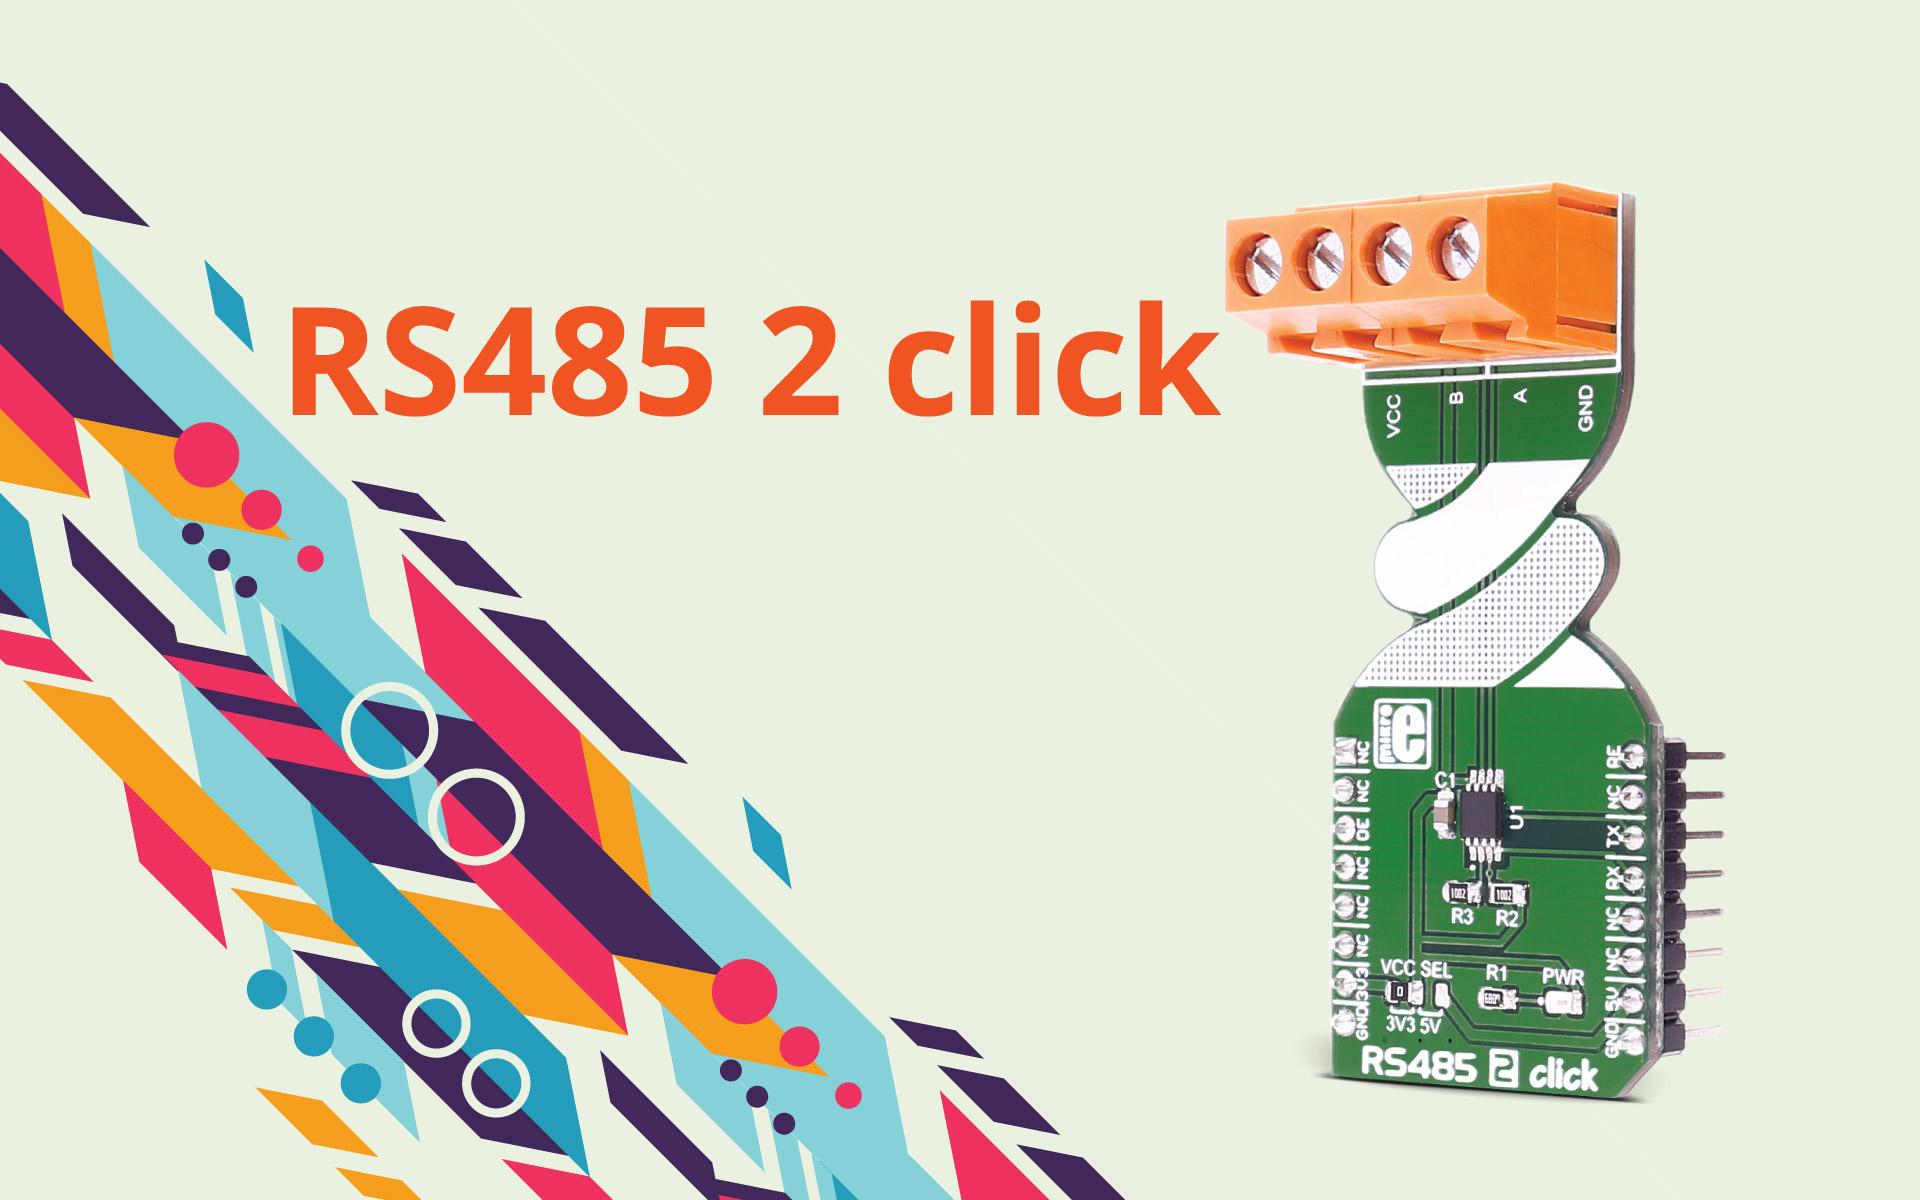 RS485 2 click - an RS485 half duplex transceiver